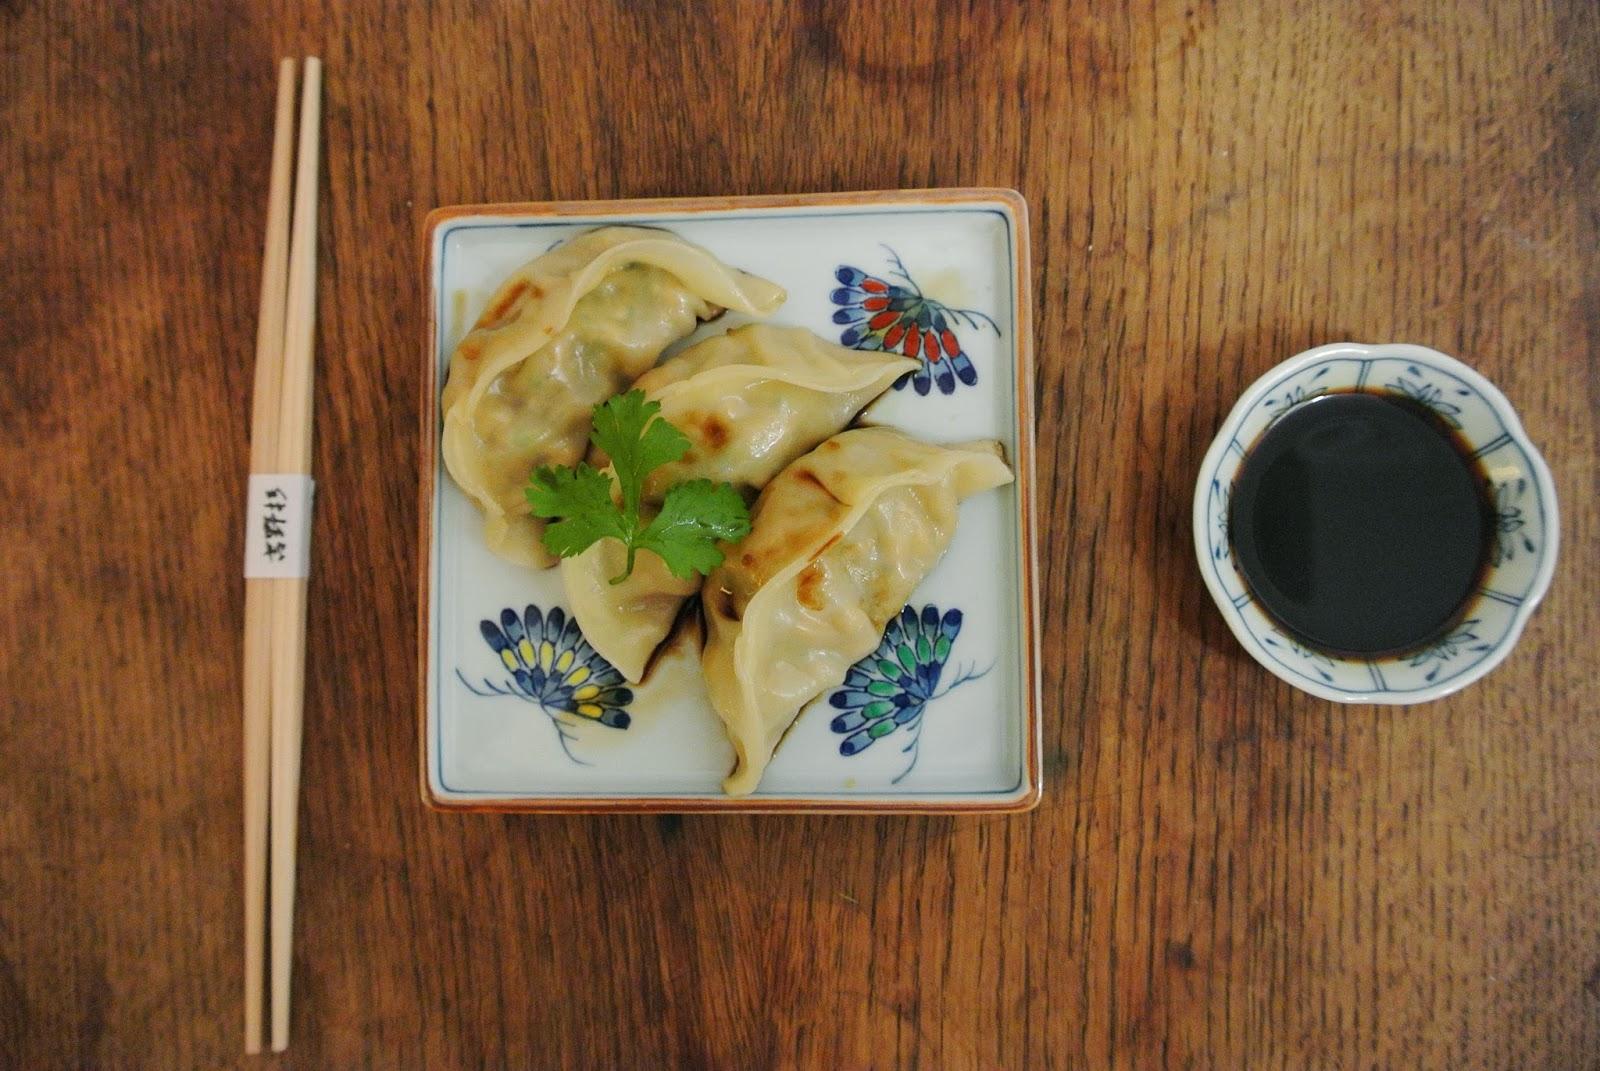 dumplings de calabacin y tofu